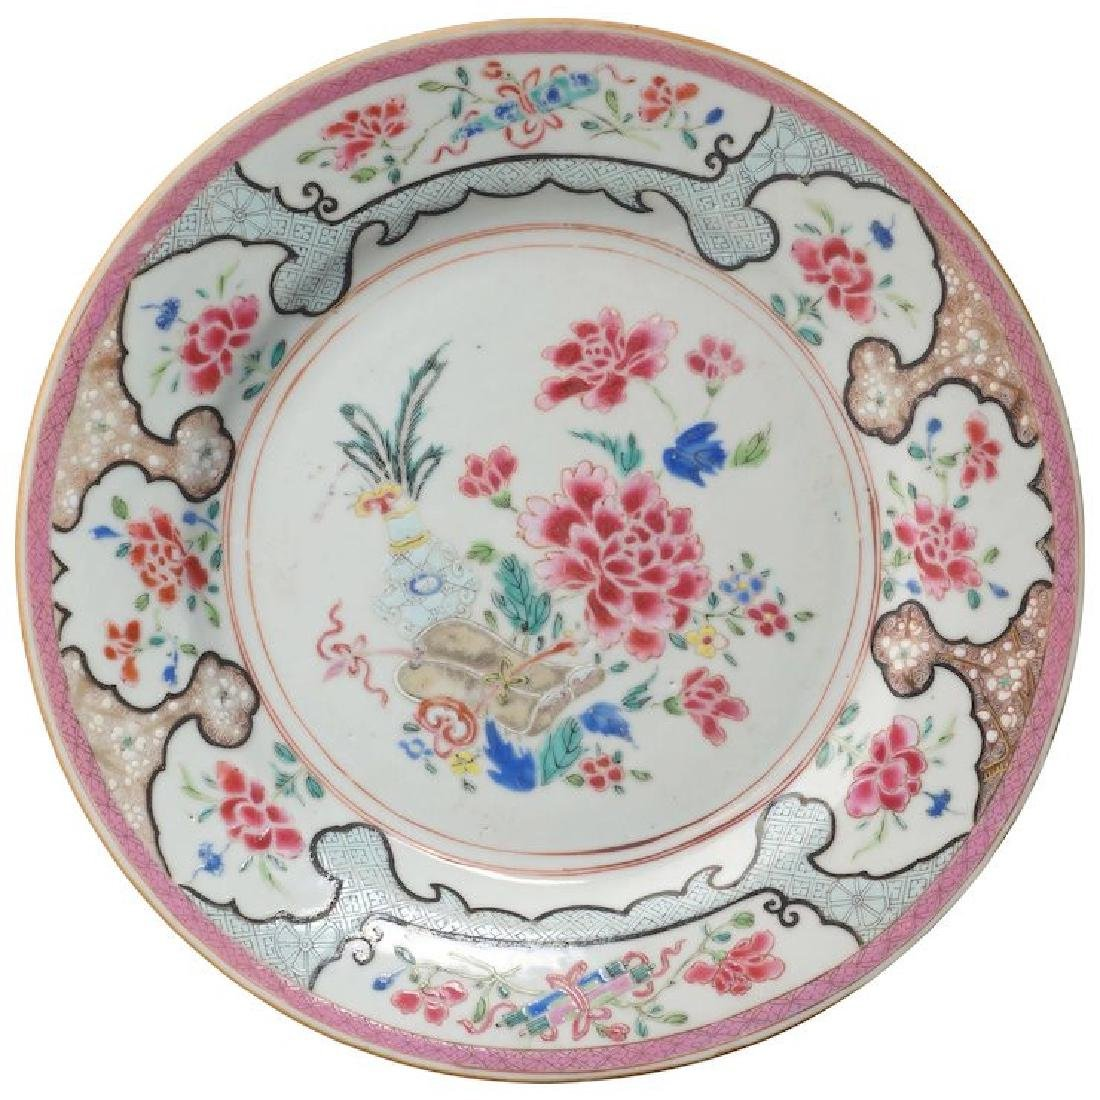 Chinese export over glaze enamel famille rose porcelain